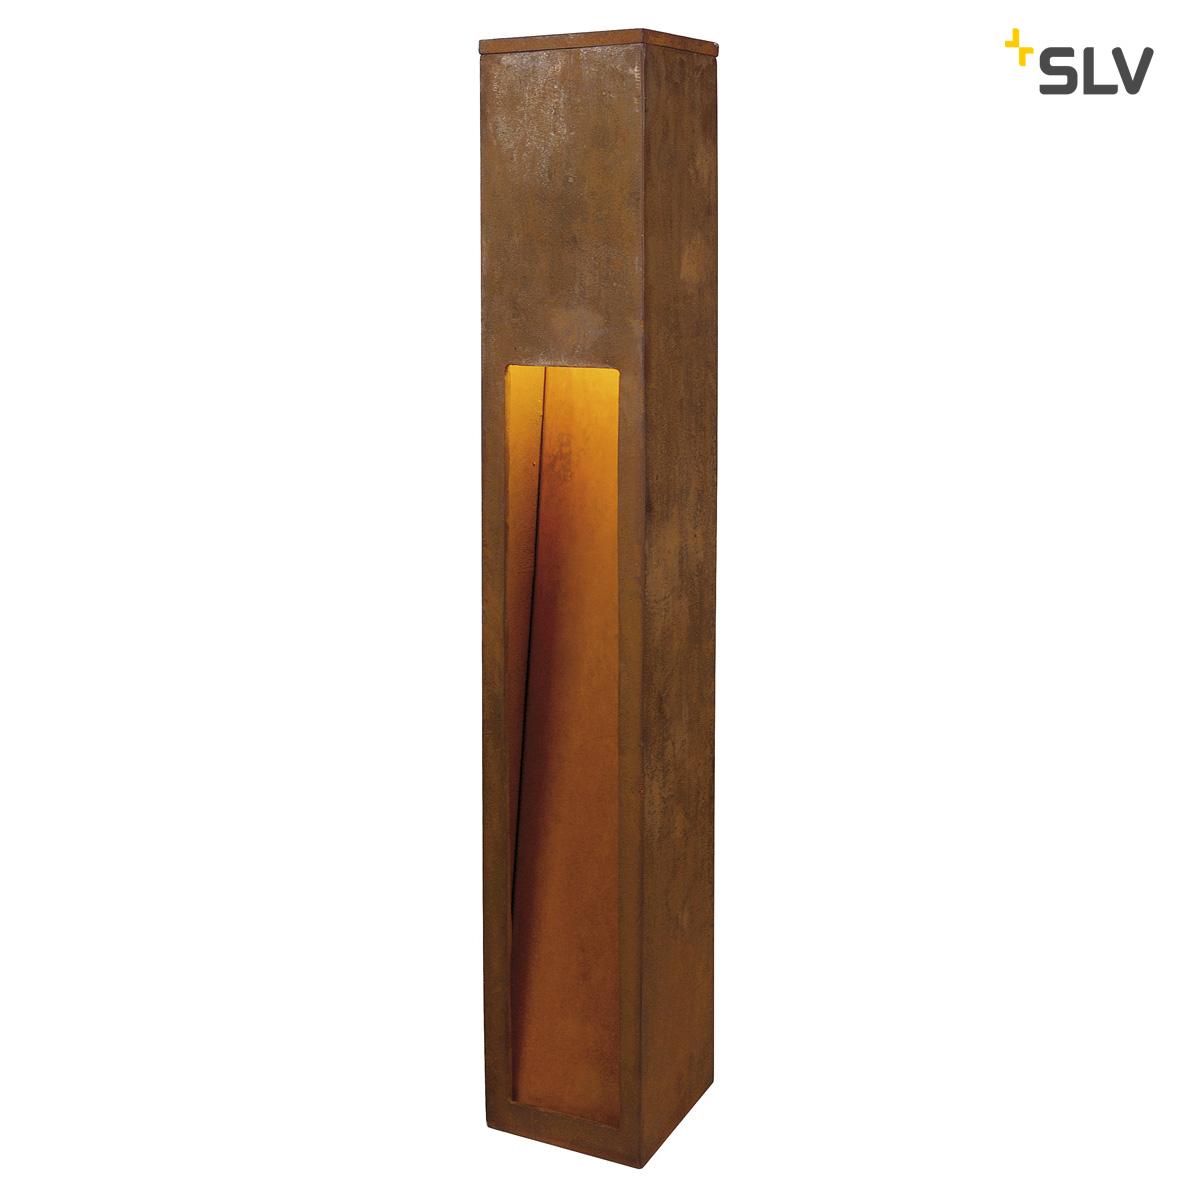 SLV - Rusty Slot 80